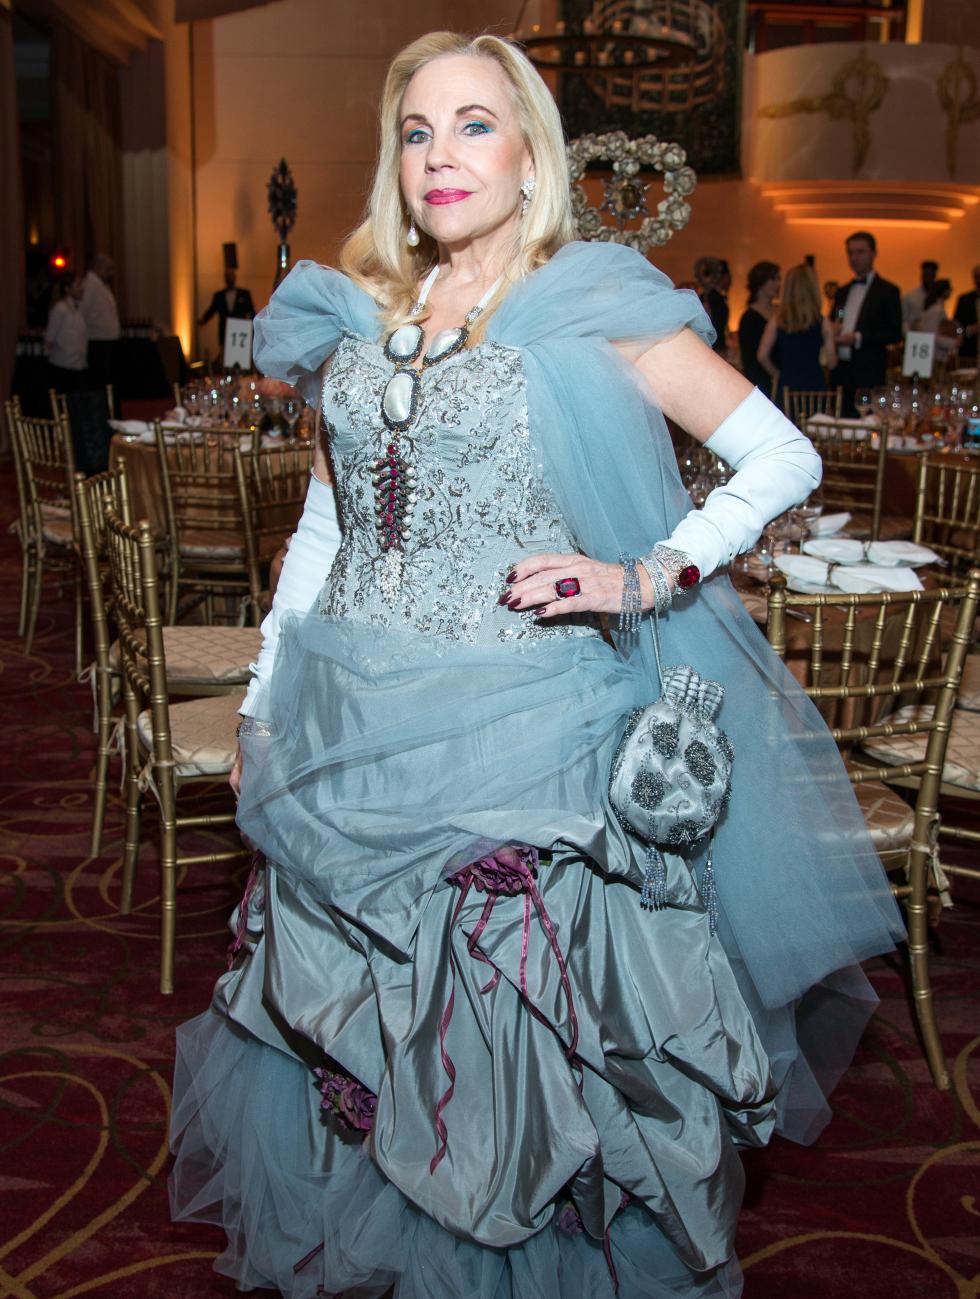 Houston, Ballet Ball gowns, Feb 2017, Dr. Carolyn Farb in vintage Vicki Tiel.